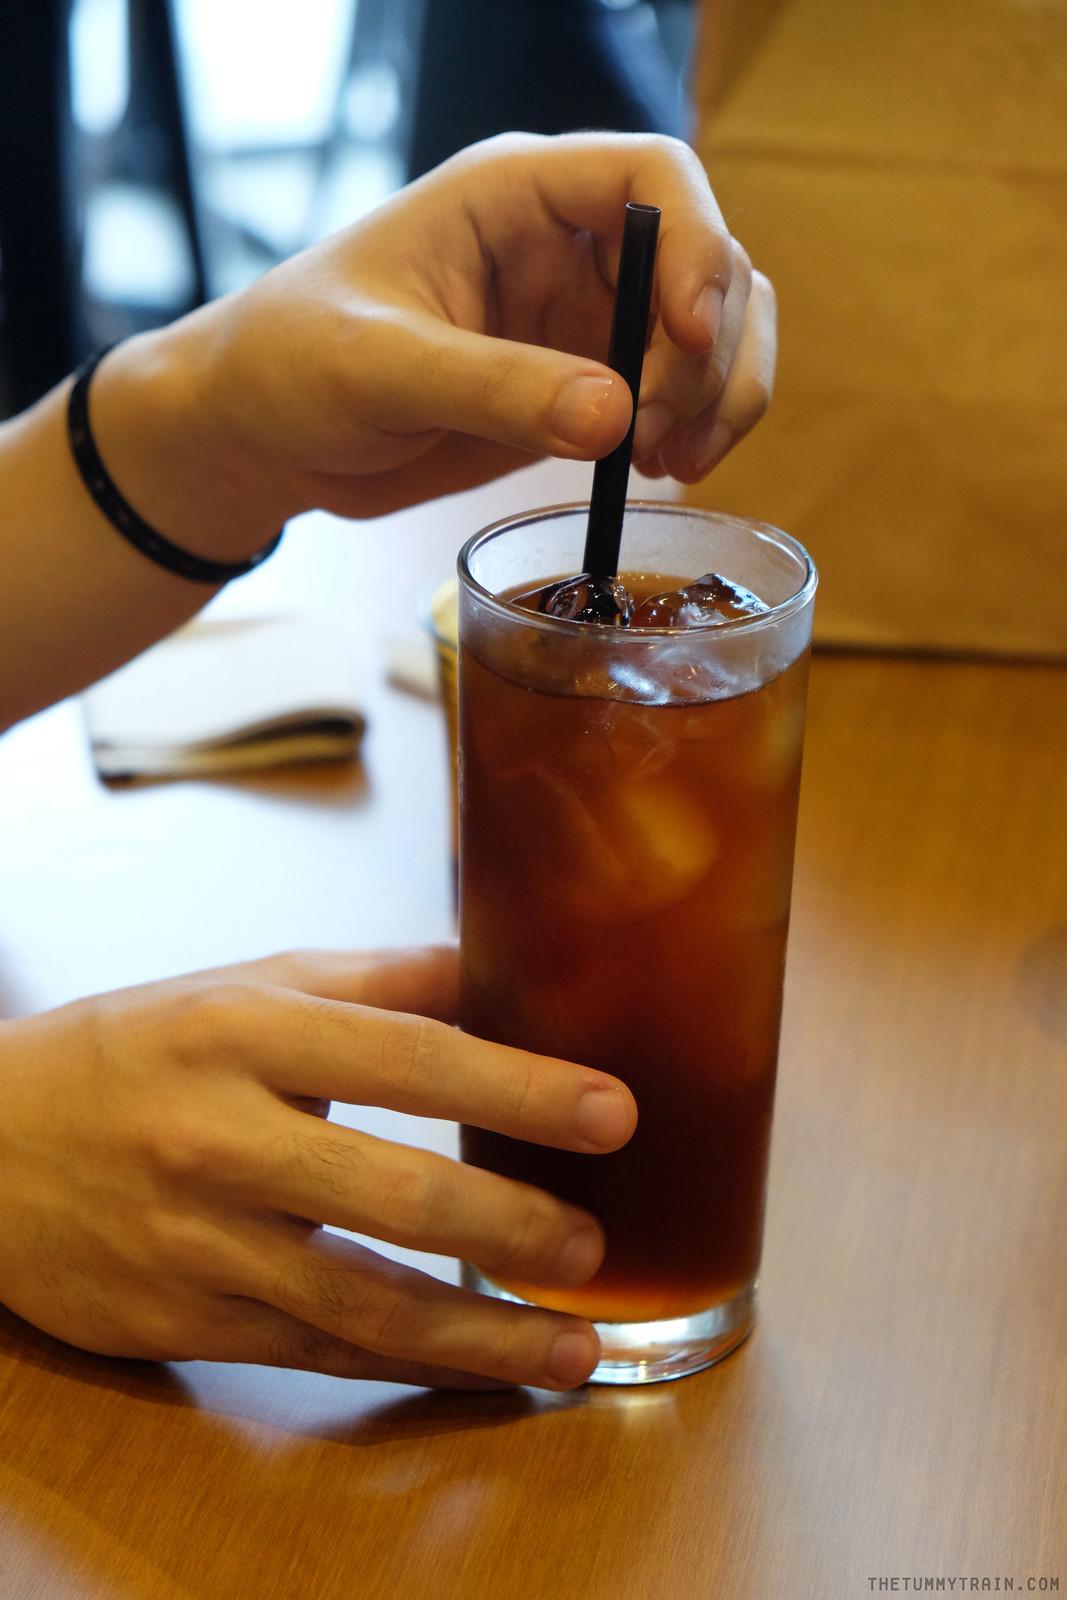 31111090395 f0c00576b7 h - A Fundamental Coffee break in Park Terraces Tower Makati